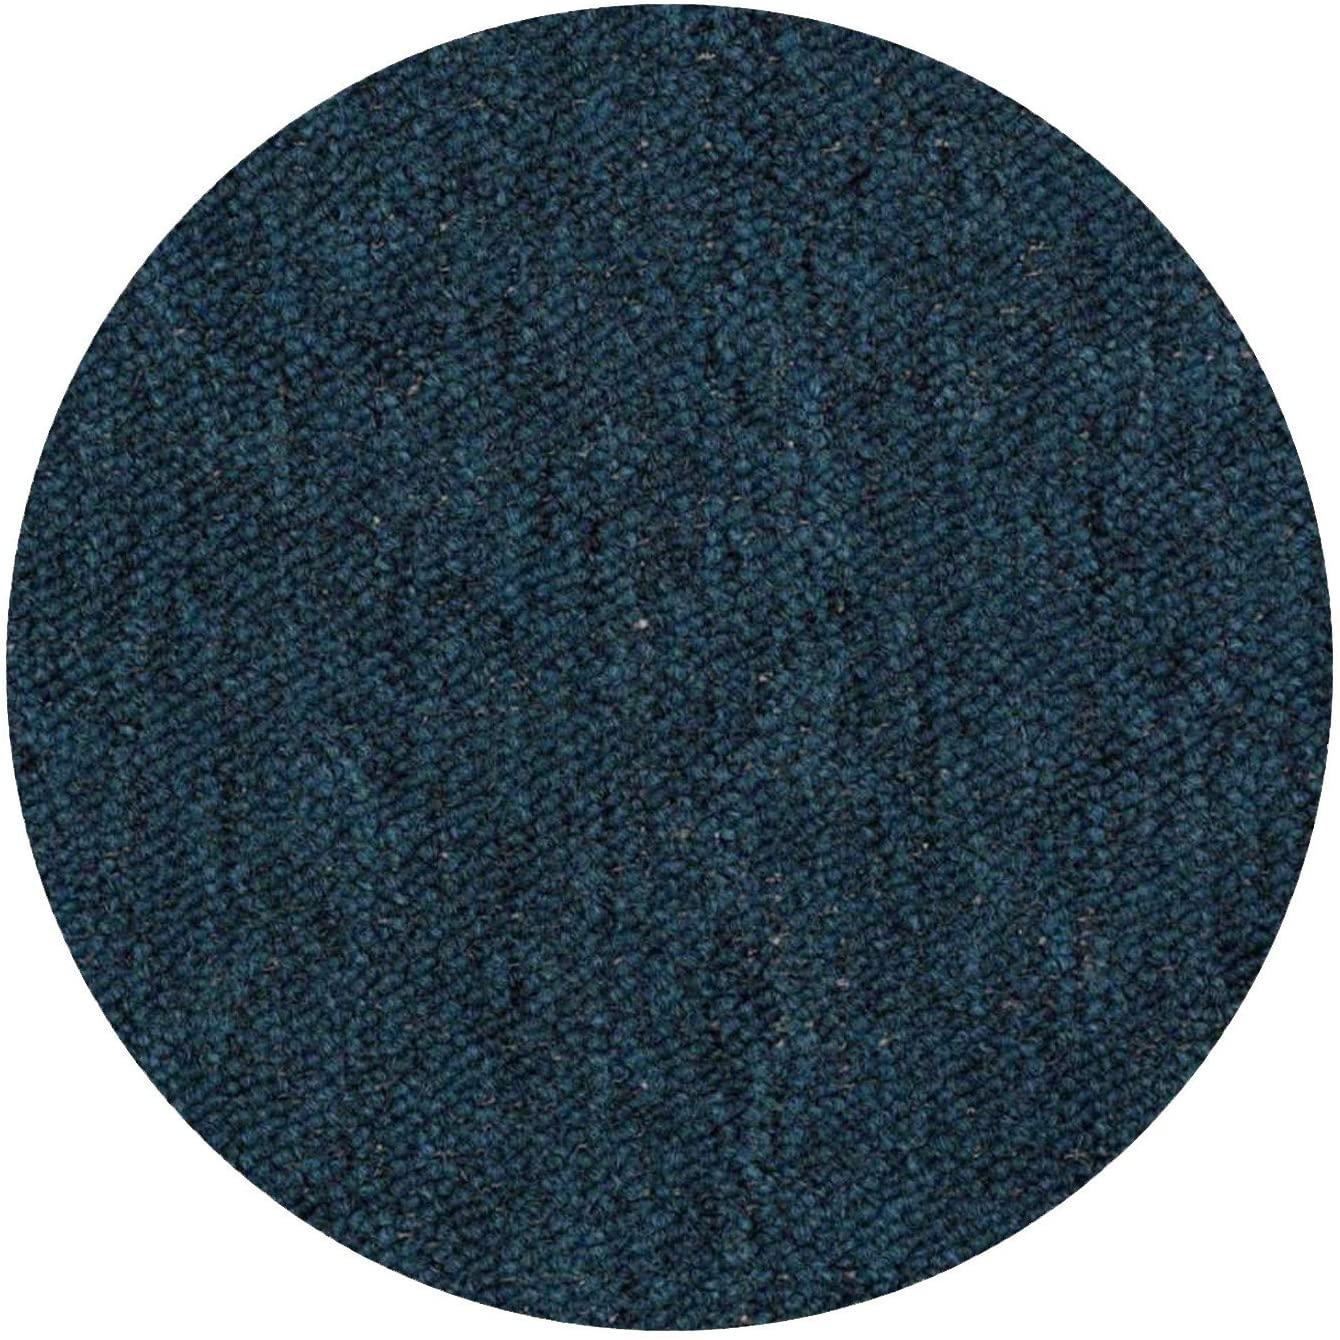 Home Queen IndoorOutdoor Commercial Teal Color Area Rug - 3' Round